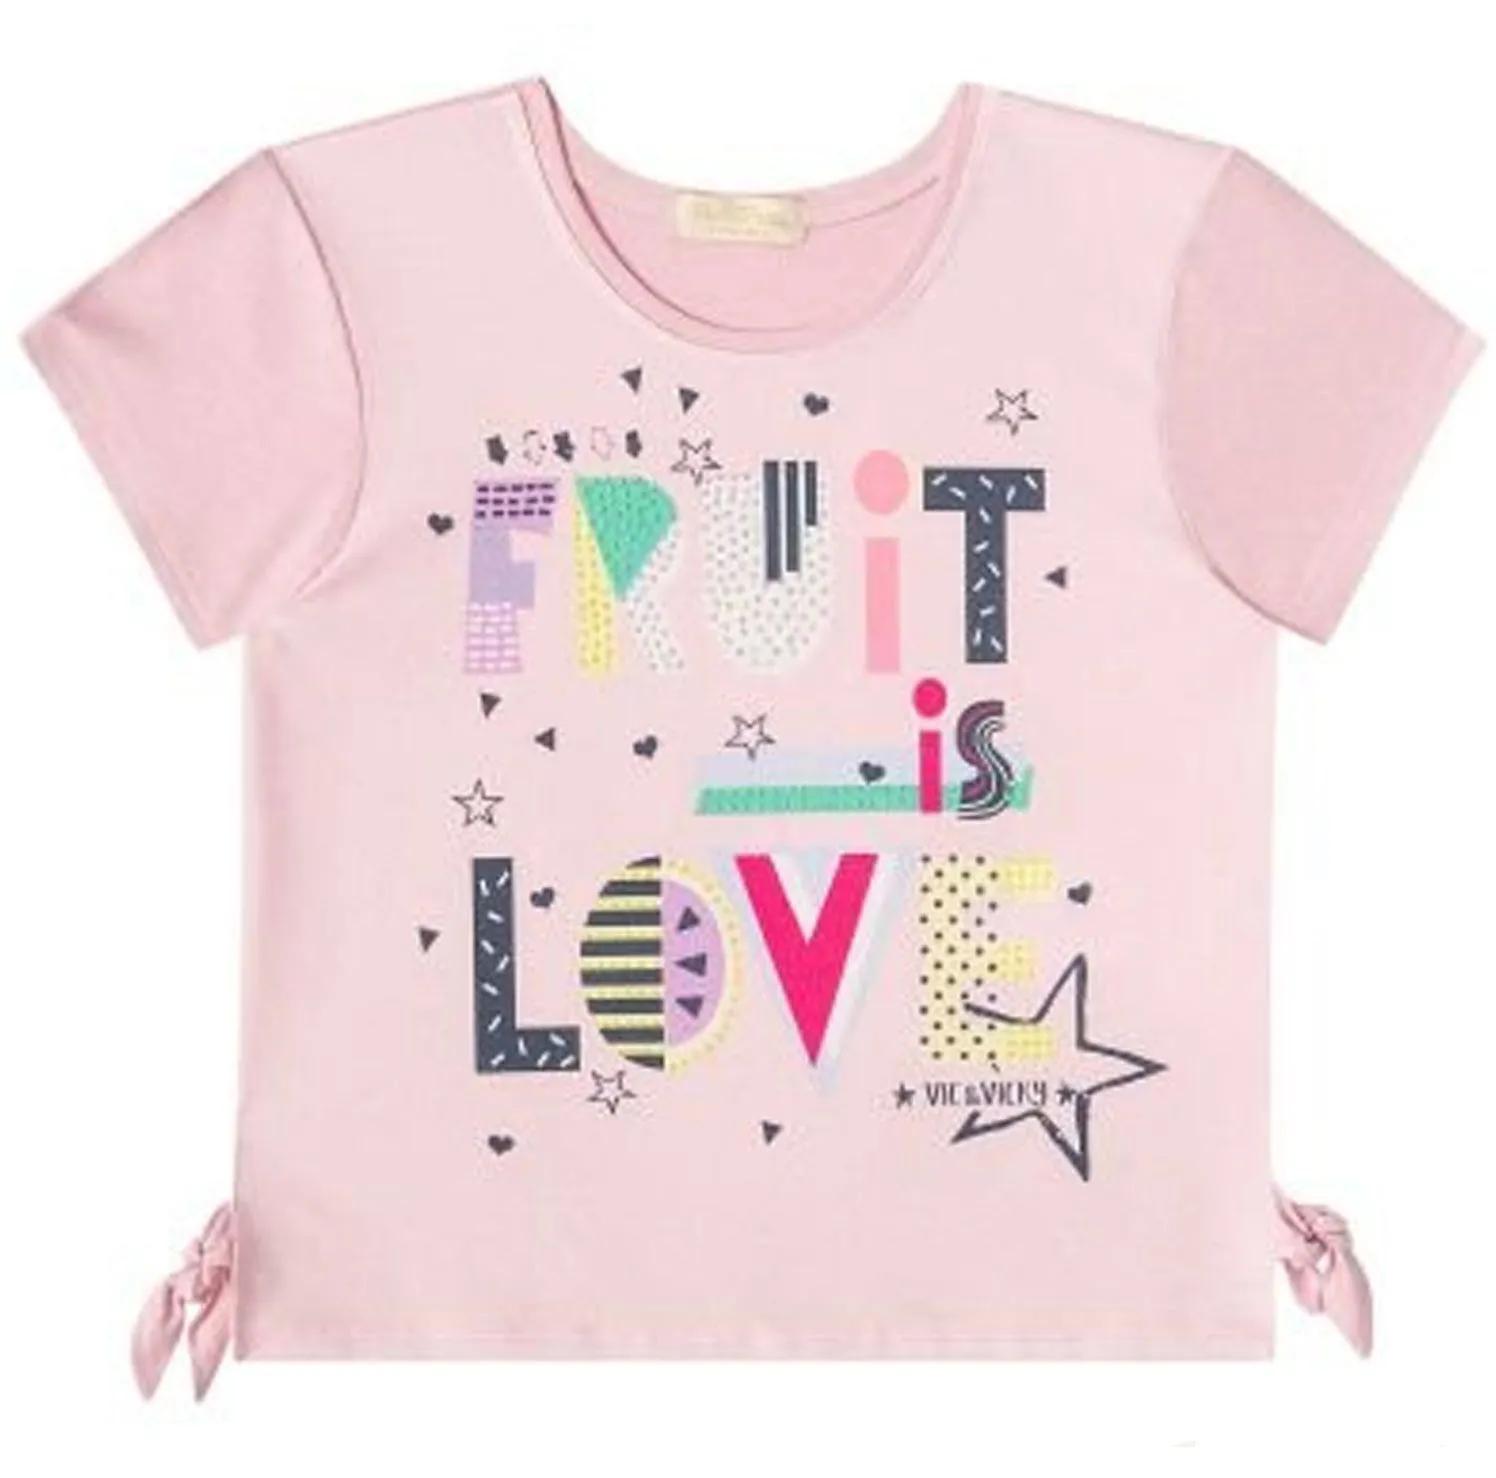 BLUSA INFANTIL MANGA CURTA VIC & VICKY REF:36768 6/10